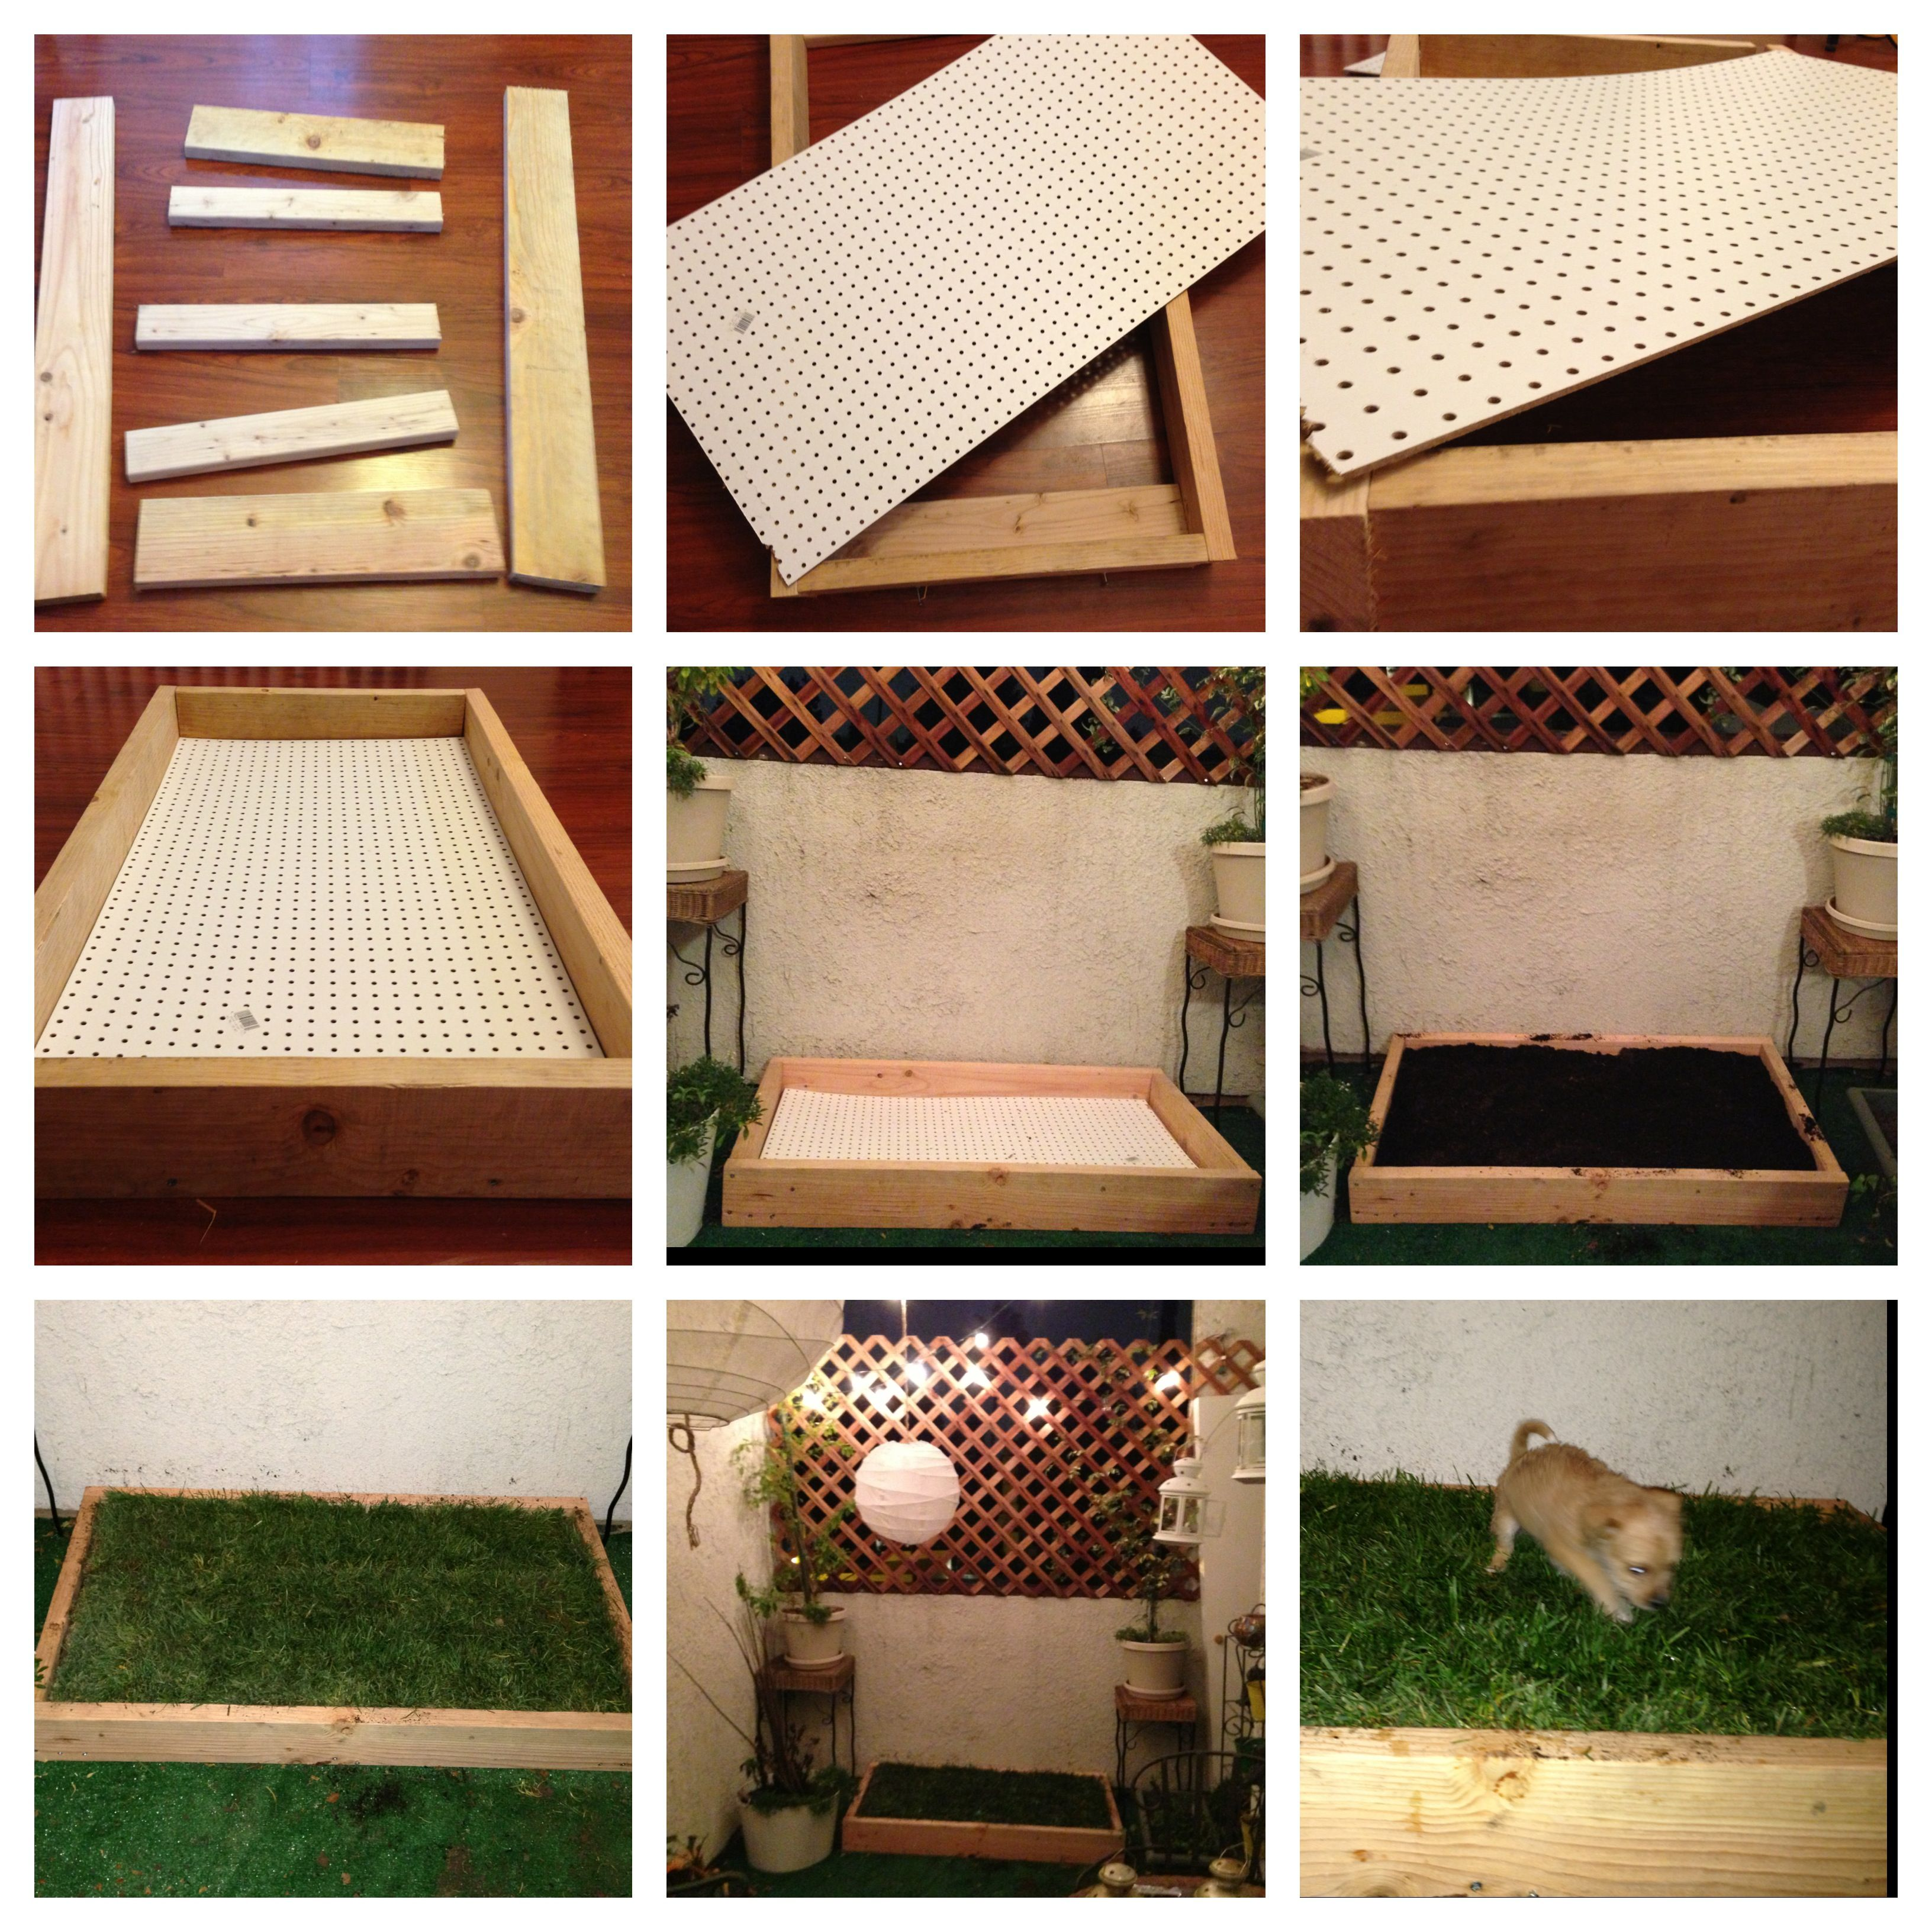 DIY Dog Grass Box! Easy To Make And Less Than $40 At Home Depot!